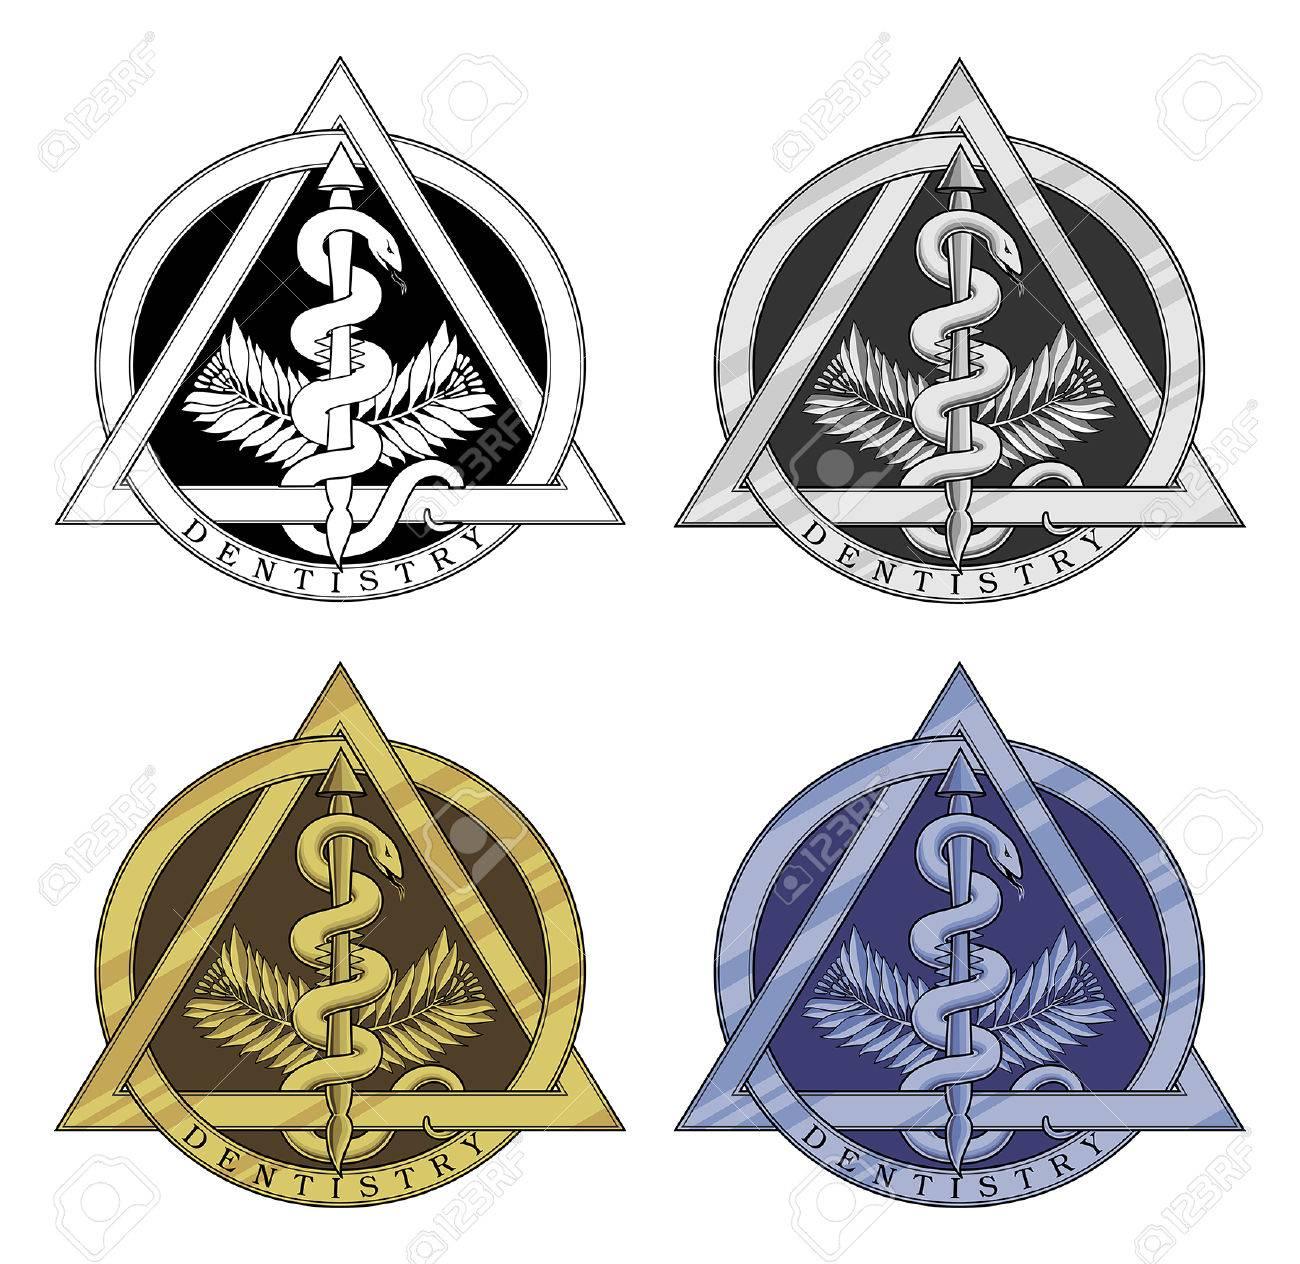 dentistry symbol four versions